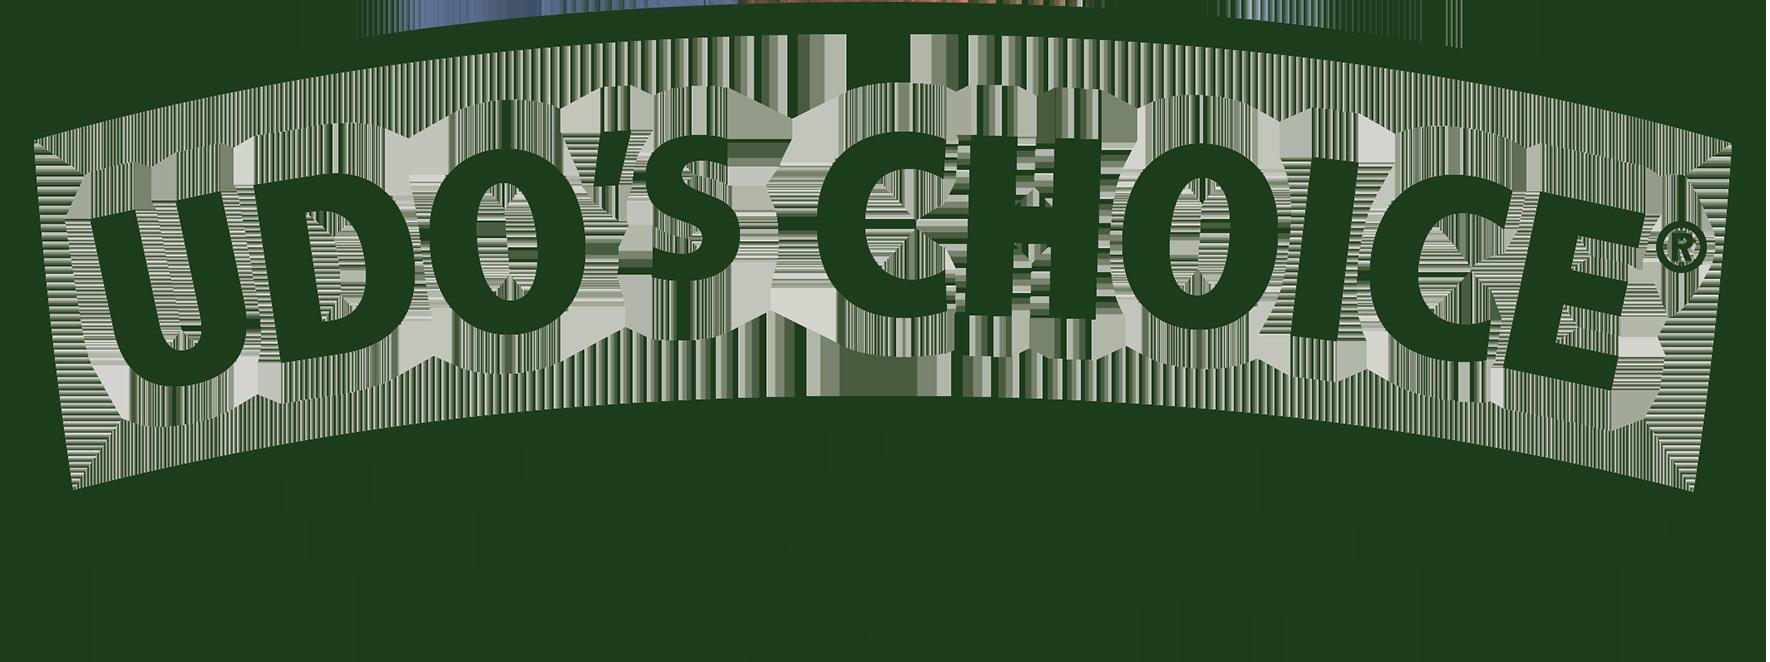 Udo s Choice